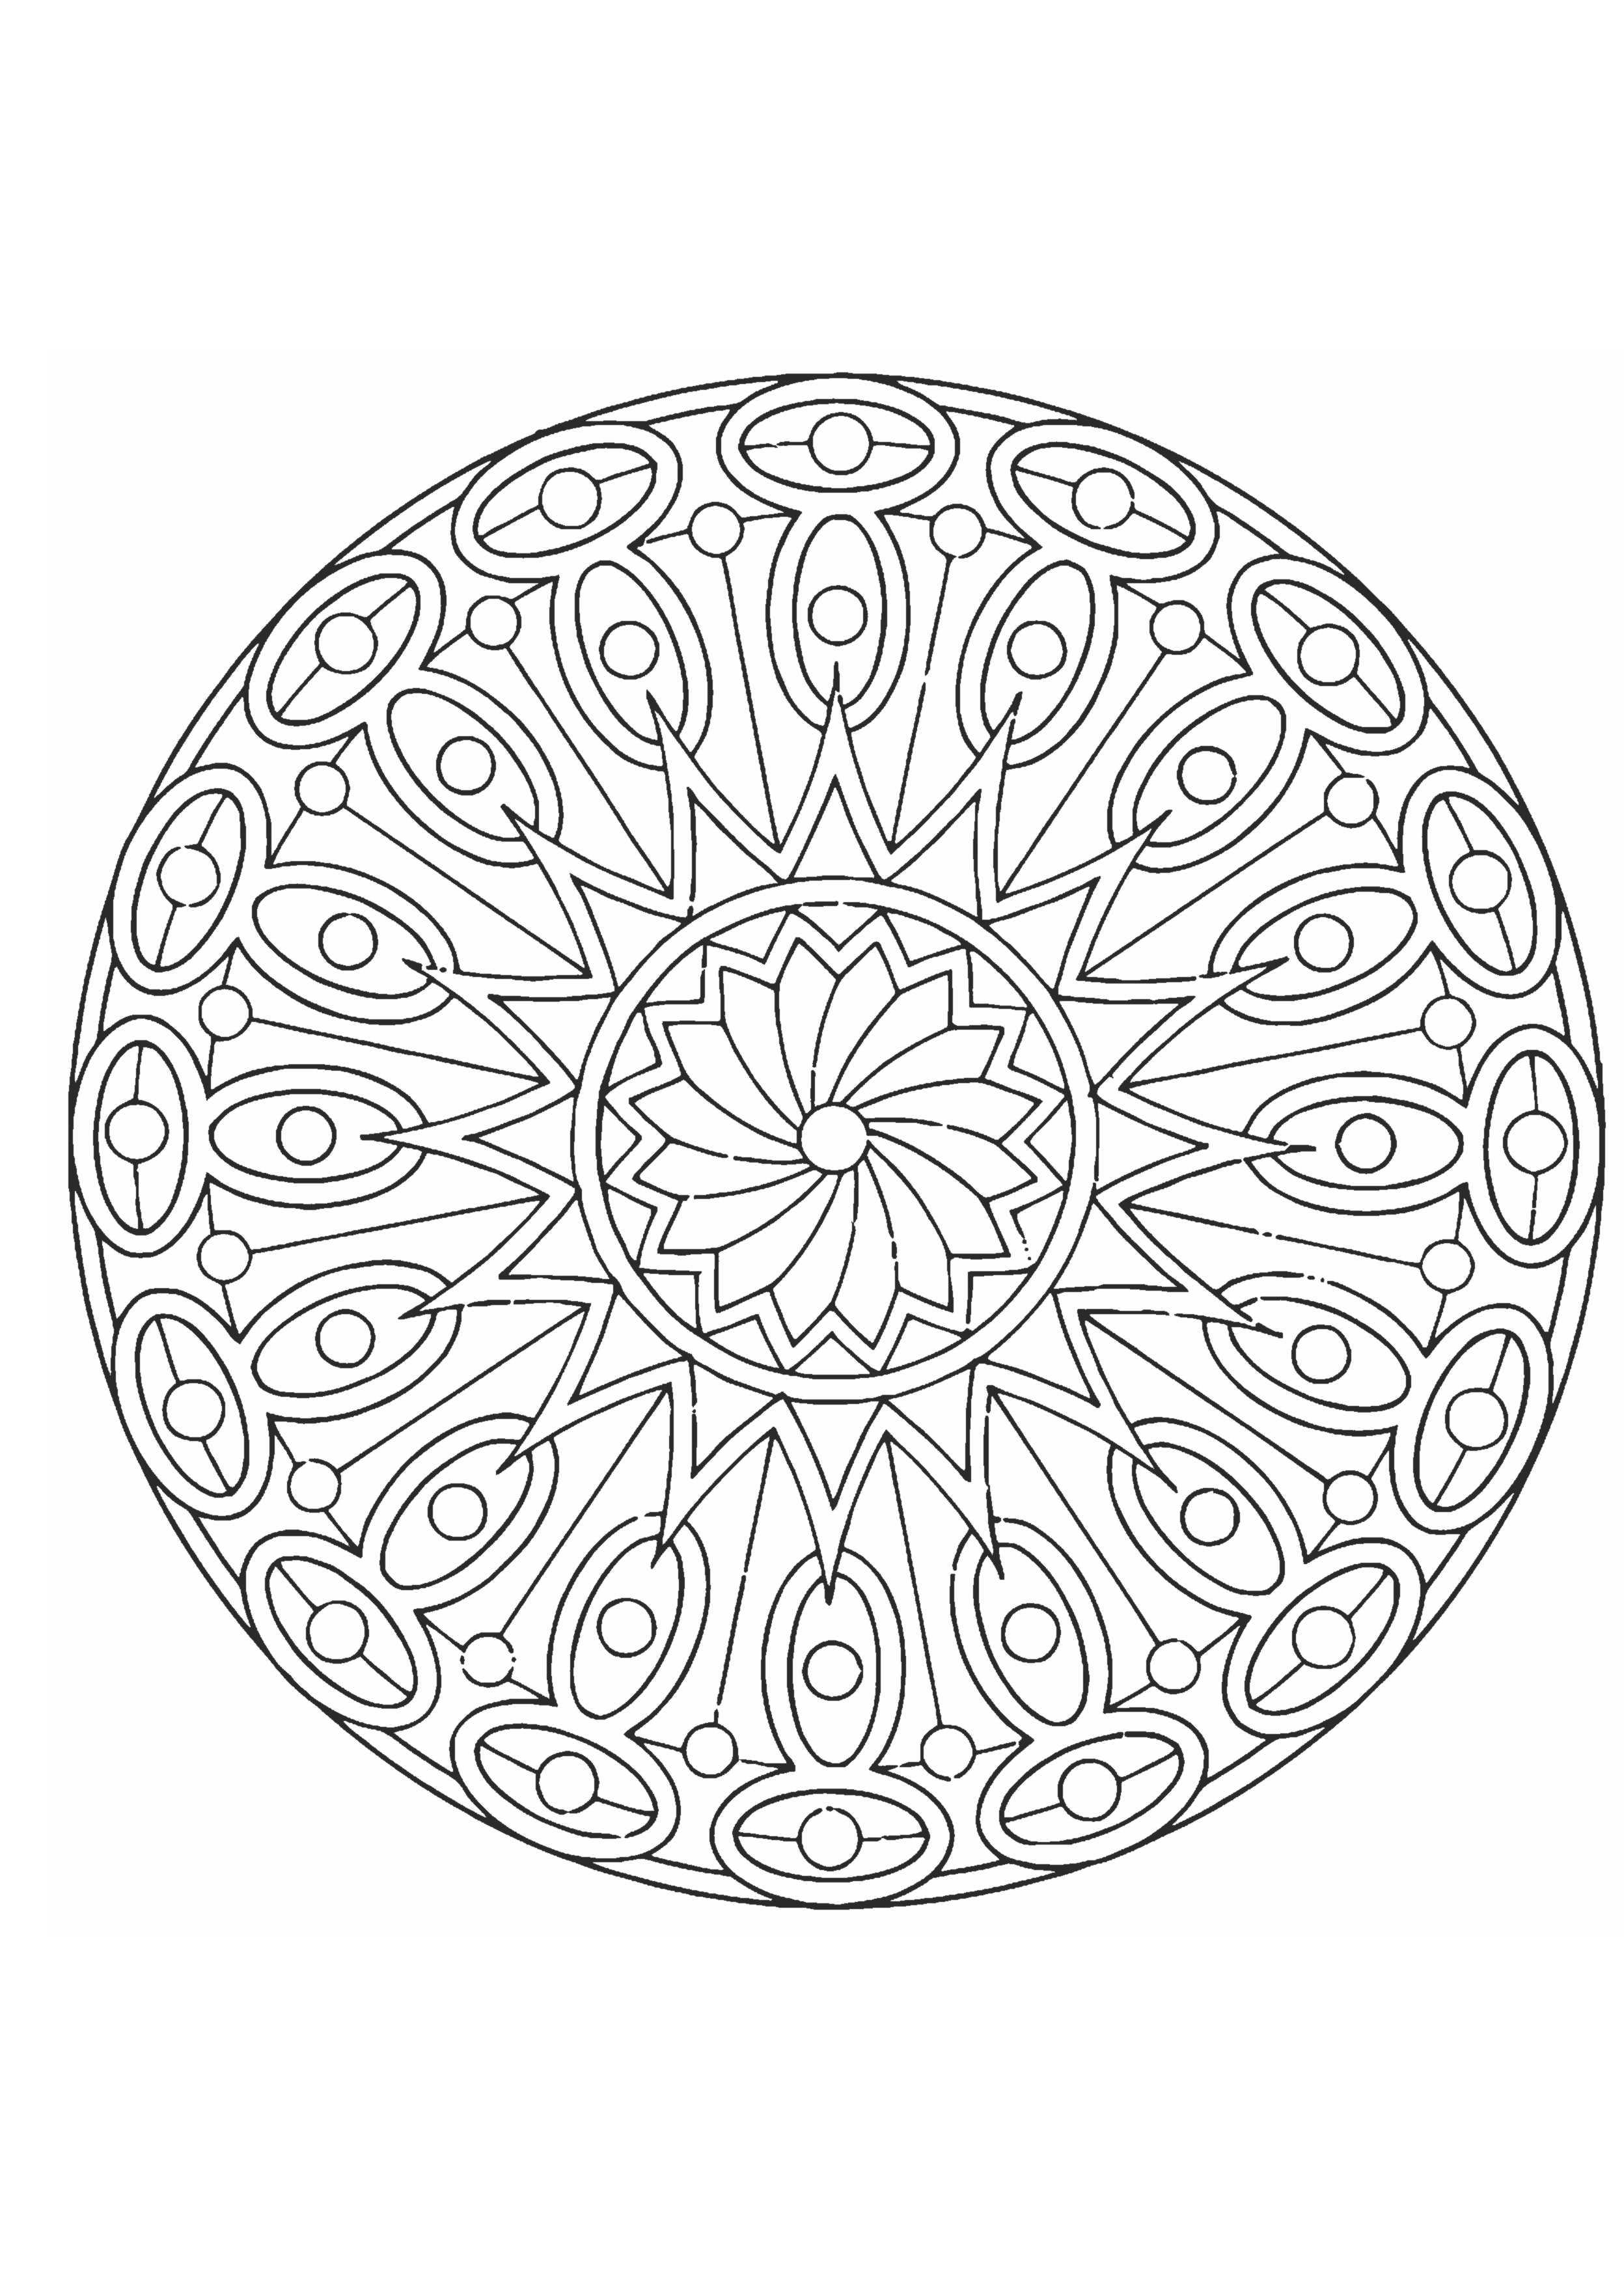 раскраска тарелка с узором раскраски а4 формата для